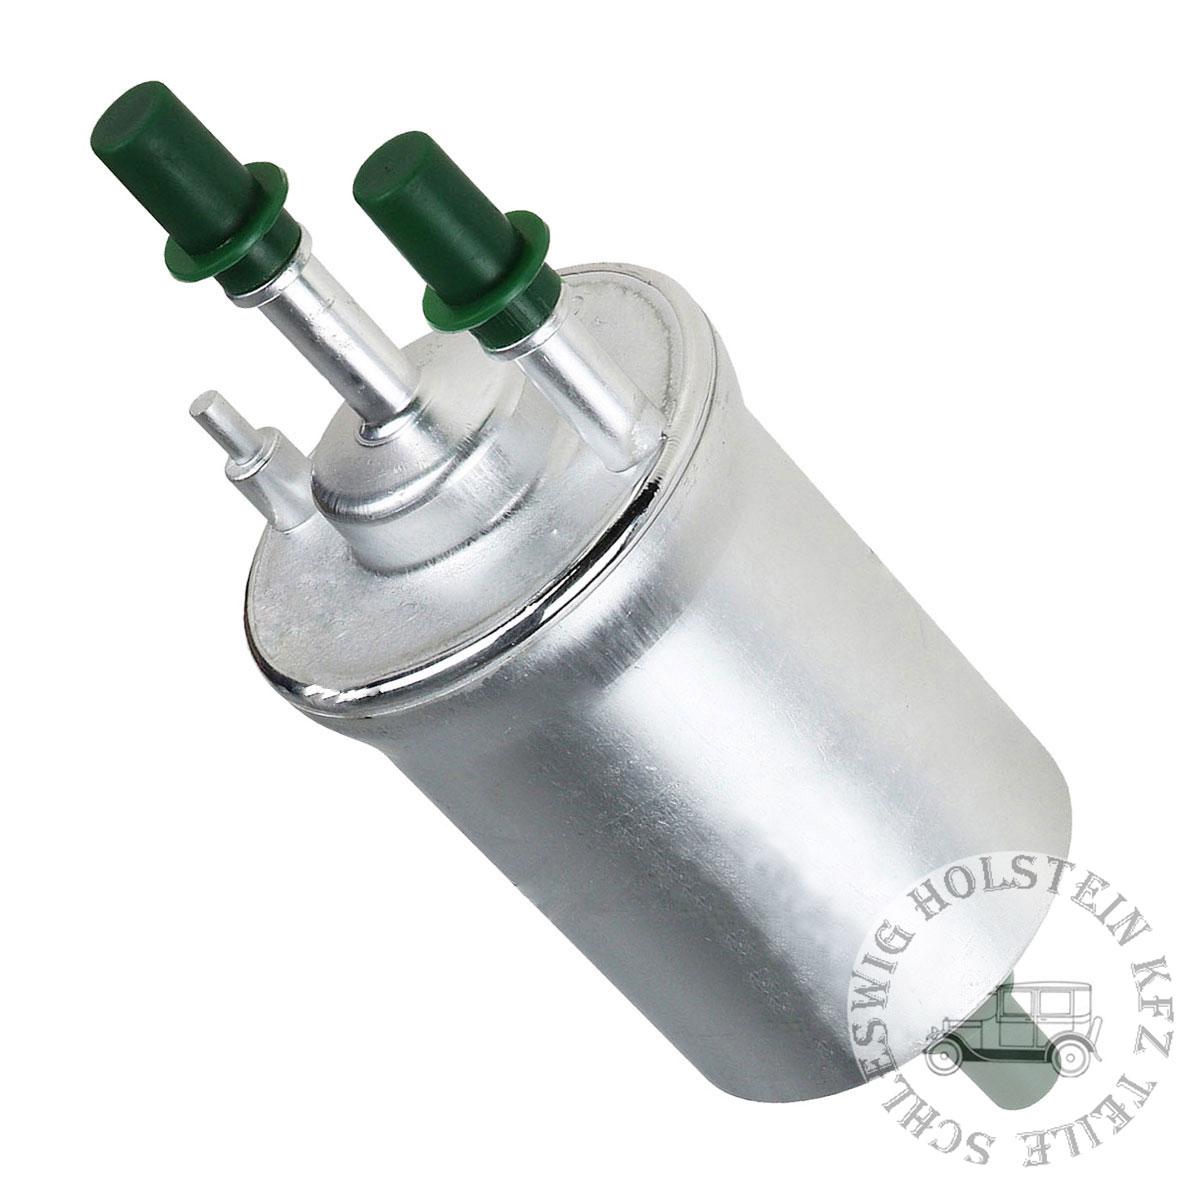 Kraftstofffilter für Alfa Romeo Audi Citroen Fiat Opel VW entsp WK 613 FT.1661